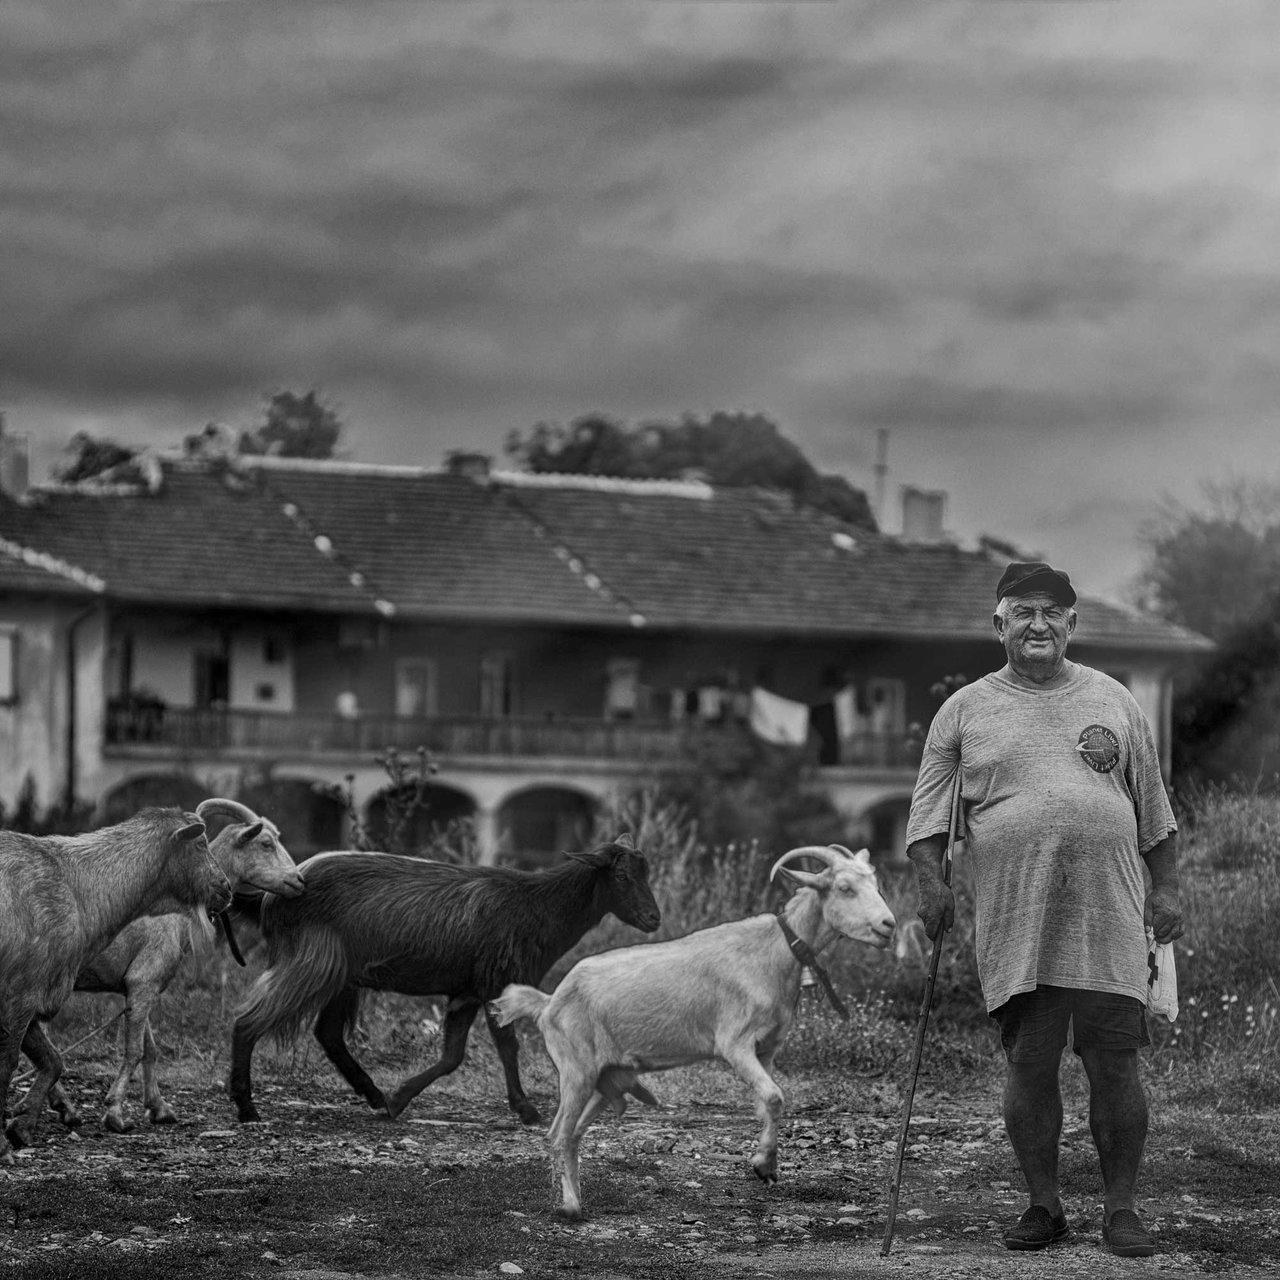 Photo in Daily round   Author Atanas Kutev - A.tnsk   PHOTO FORUM